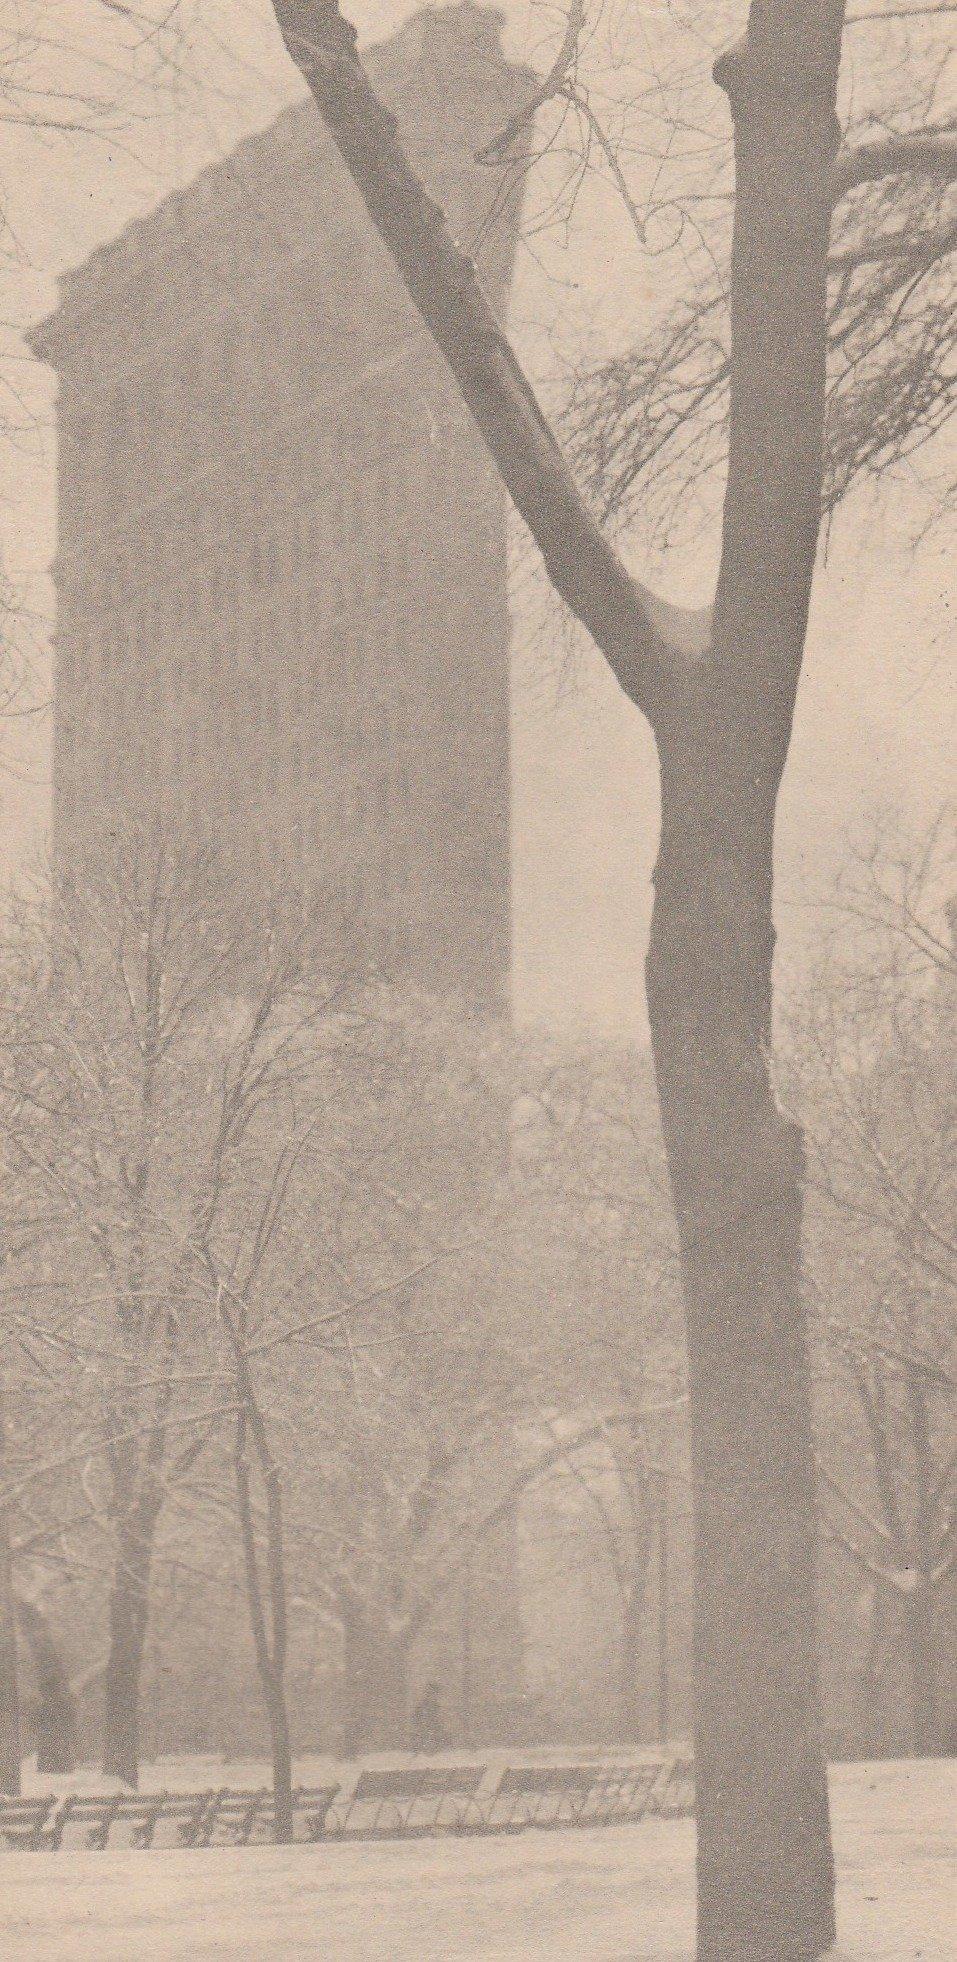 Alfred Stieglitz - The Flat Iron